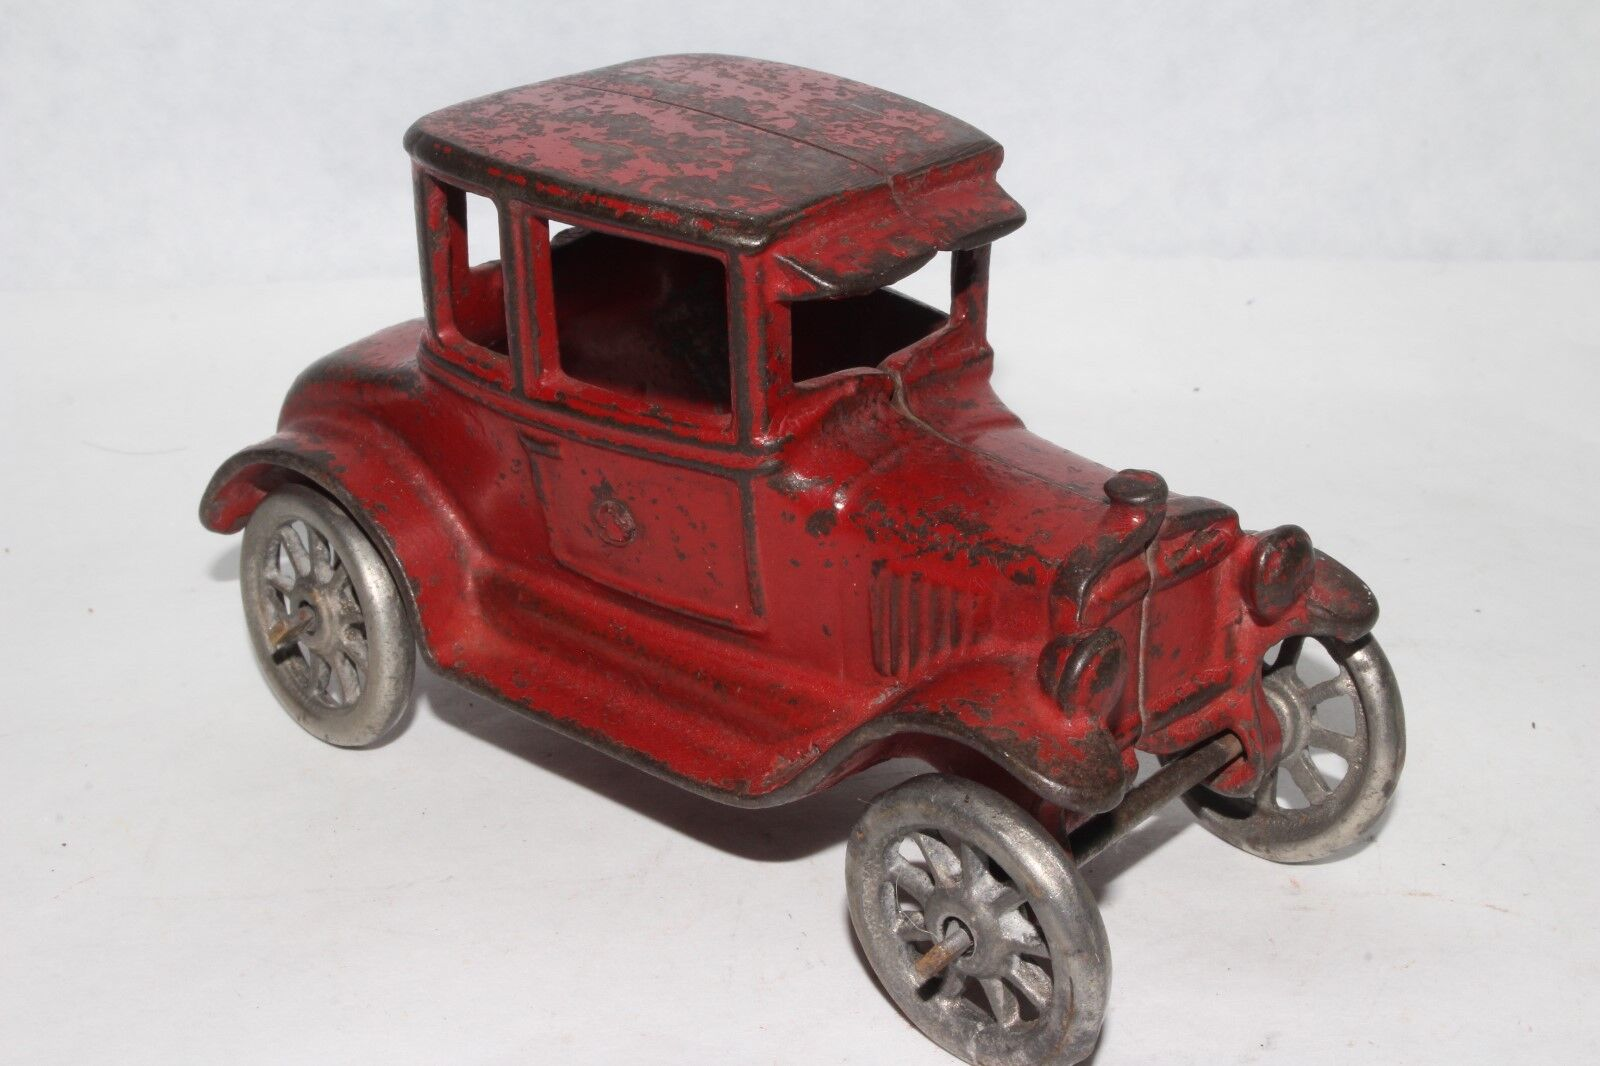 Década de 1920 AC Williams modelo modelo modelo T de hierro fundido Ford Coupe, Original  mejor calidad mejor precio